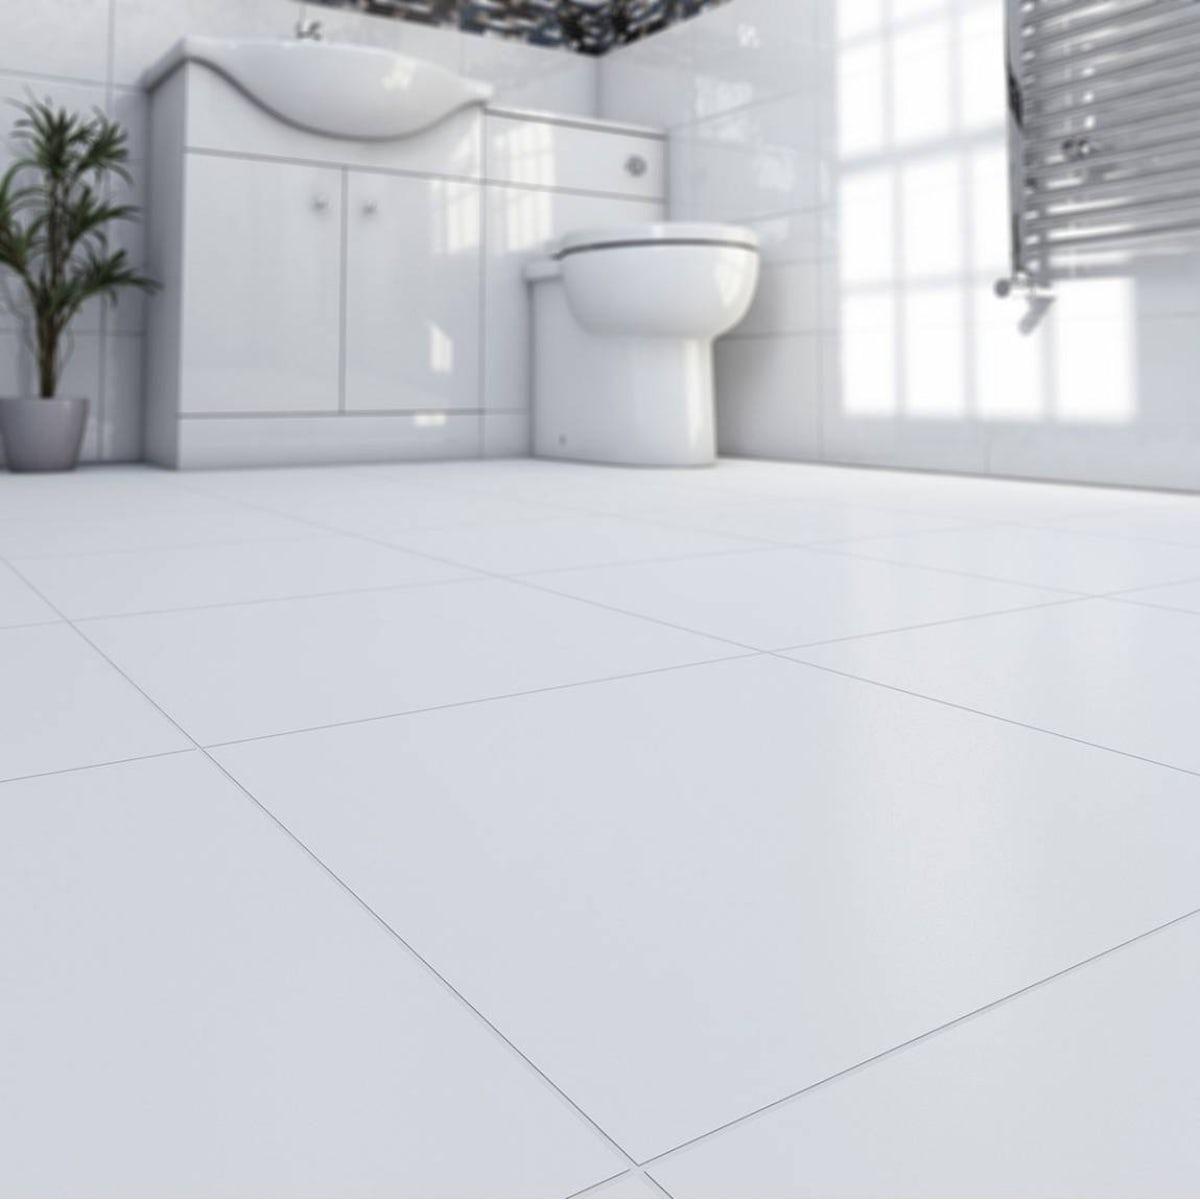 Oria matte super white ceramic floor tile 33cm x 33cm - White ceramic wall tiles bathroom ...